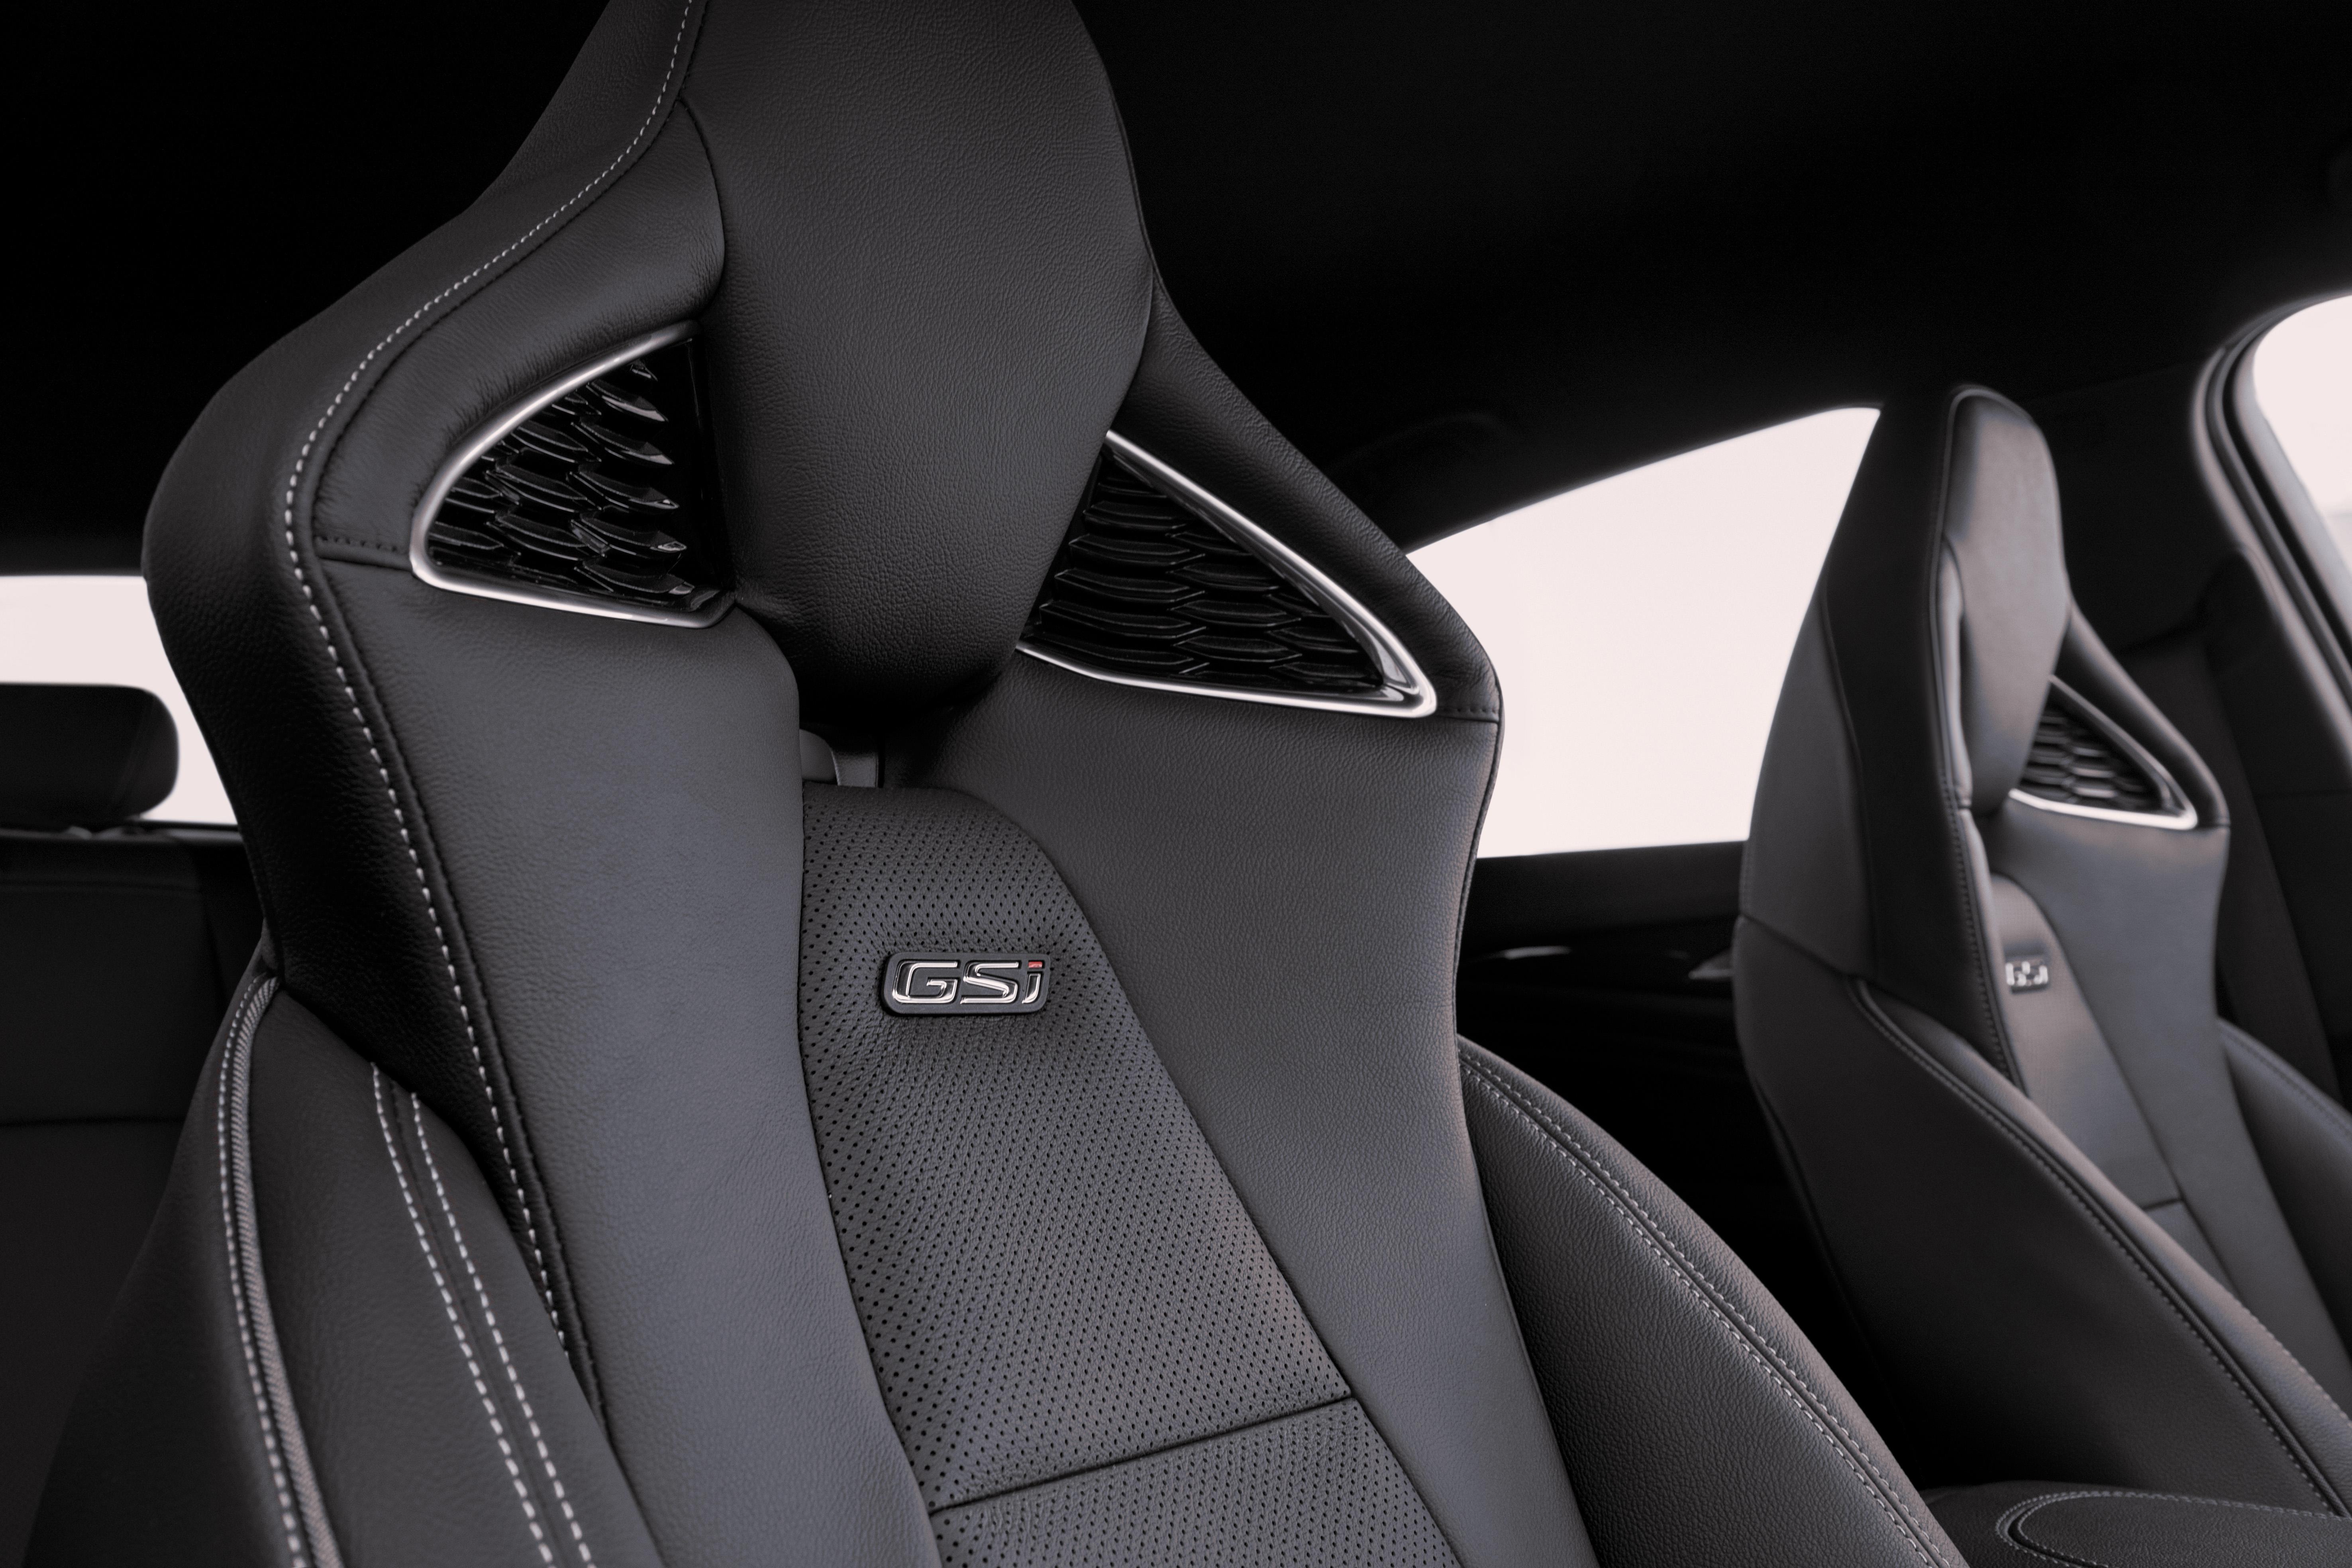 Opel-Insignia-GSi-501631